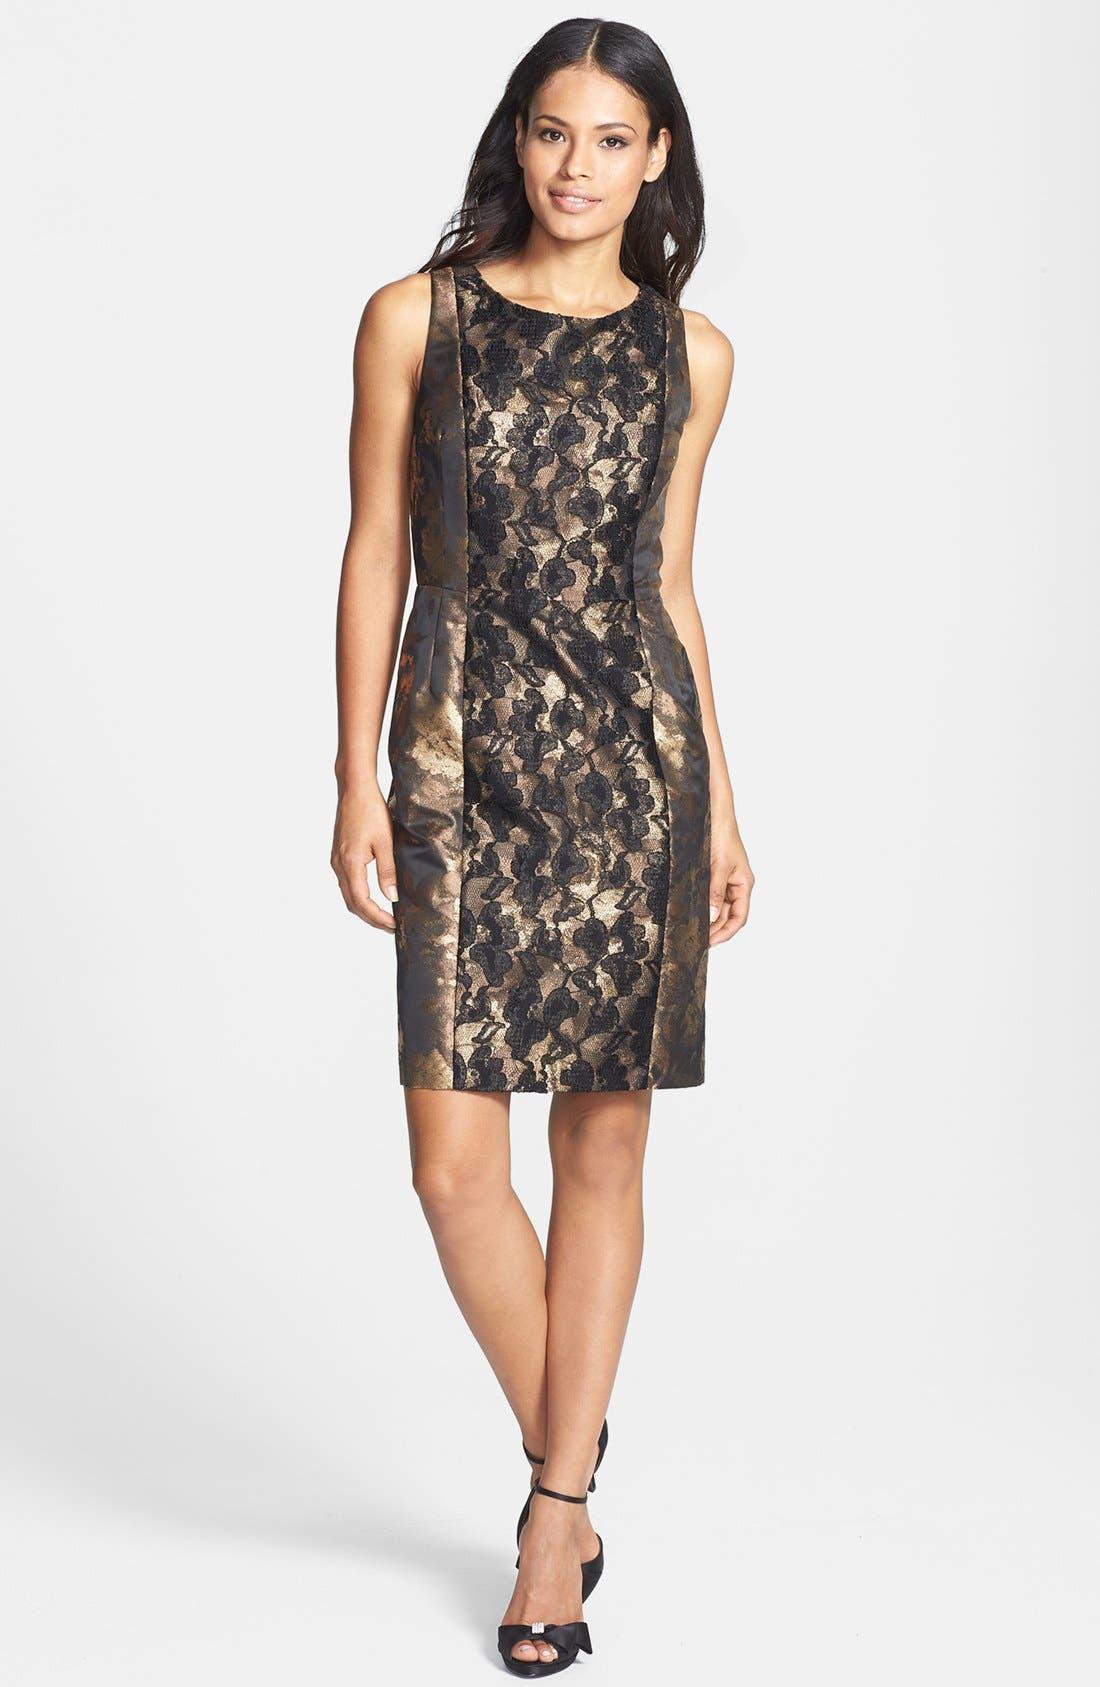 Alternate Image 1 Selected - Donna Ricco Metallic Lace & Jacquard Sheath Dress (Petite)